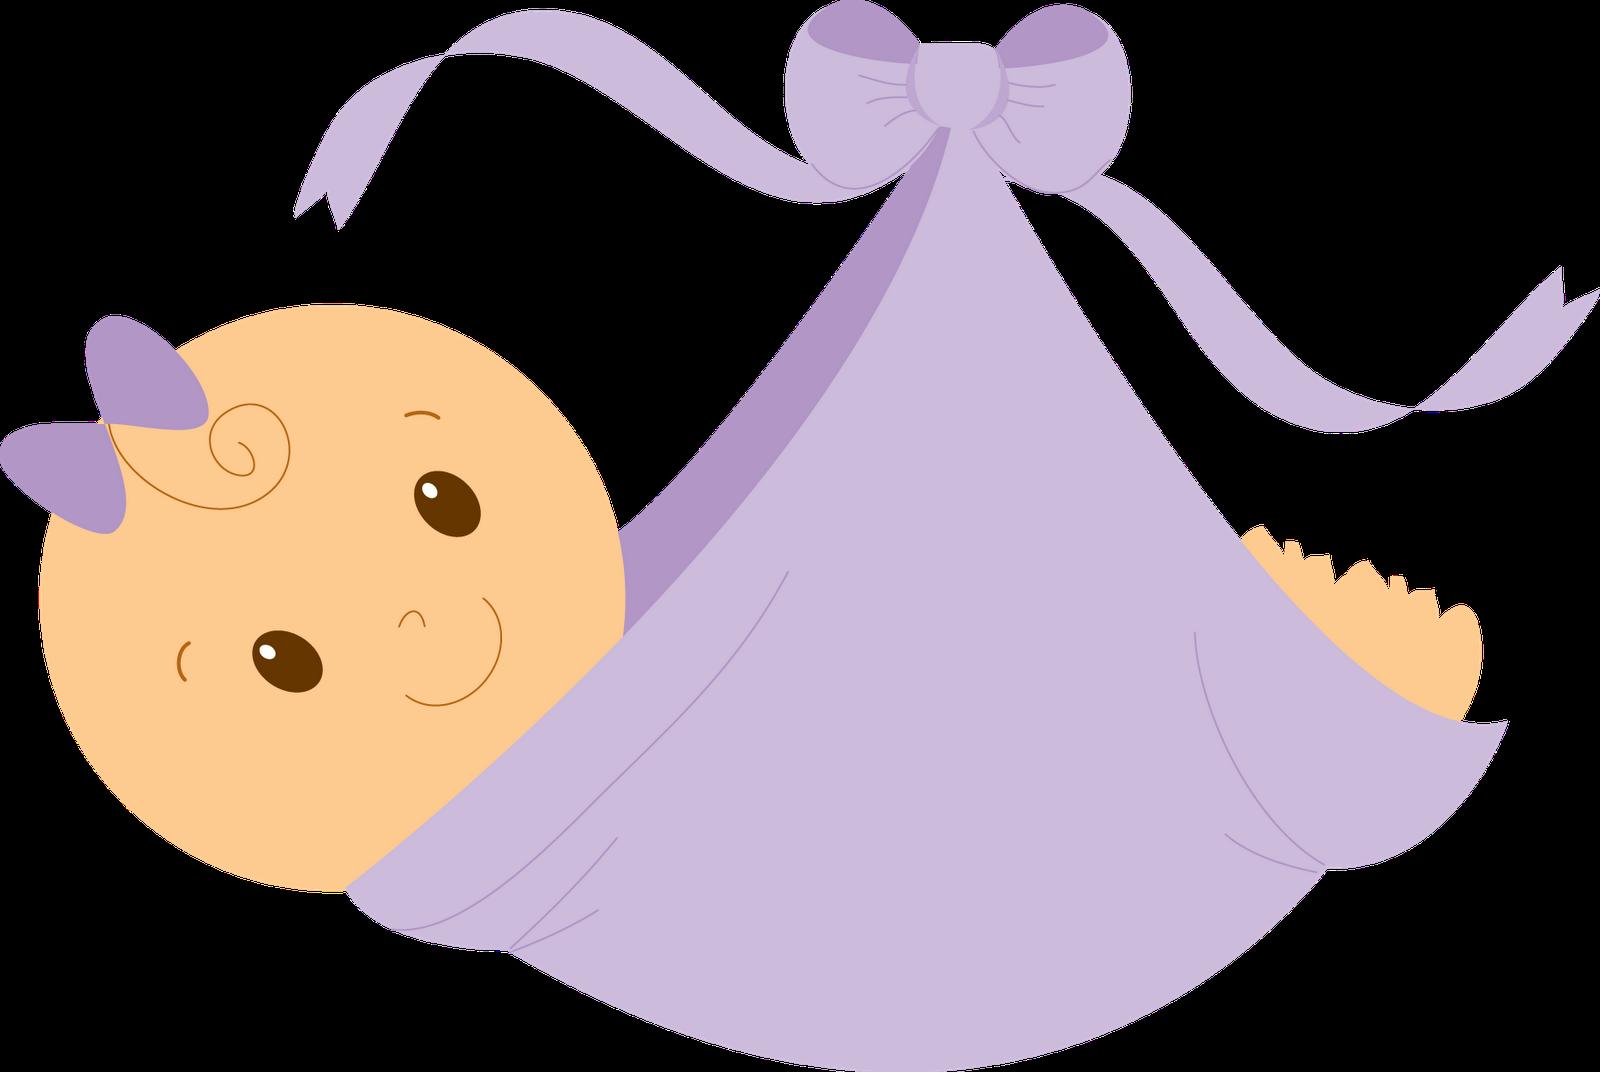 Footprint clipart purple. Baby clip art espero